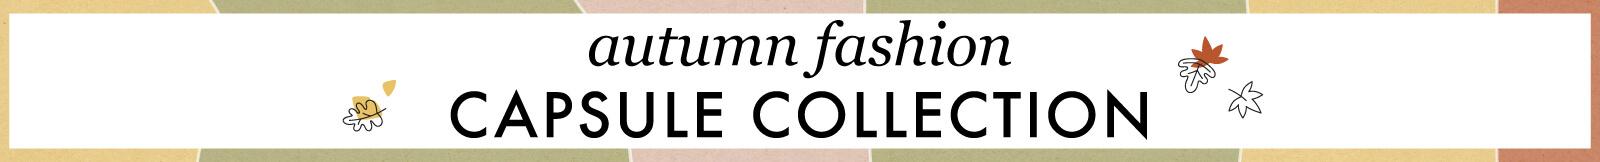 Autumn Fashion Capsule Collection